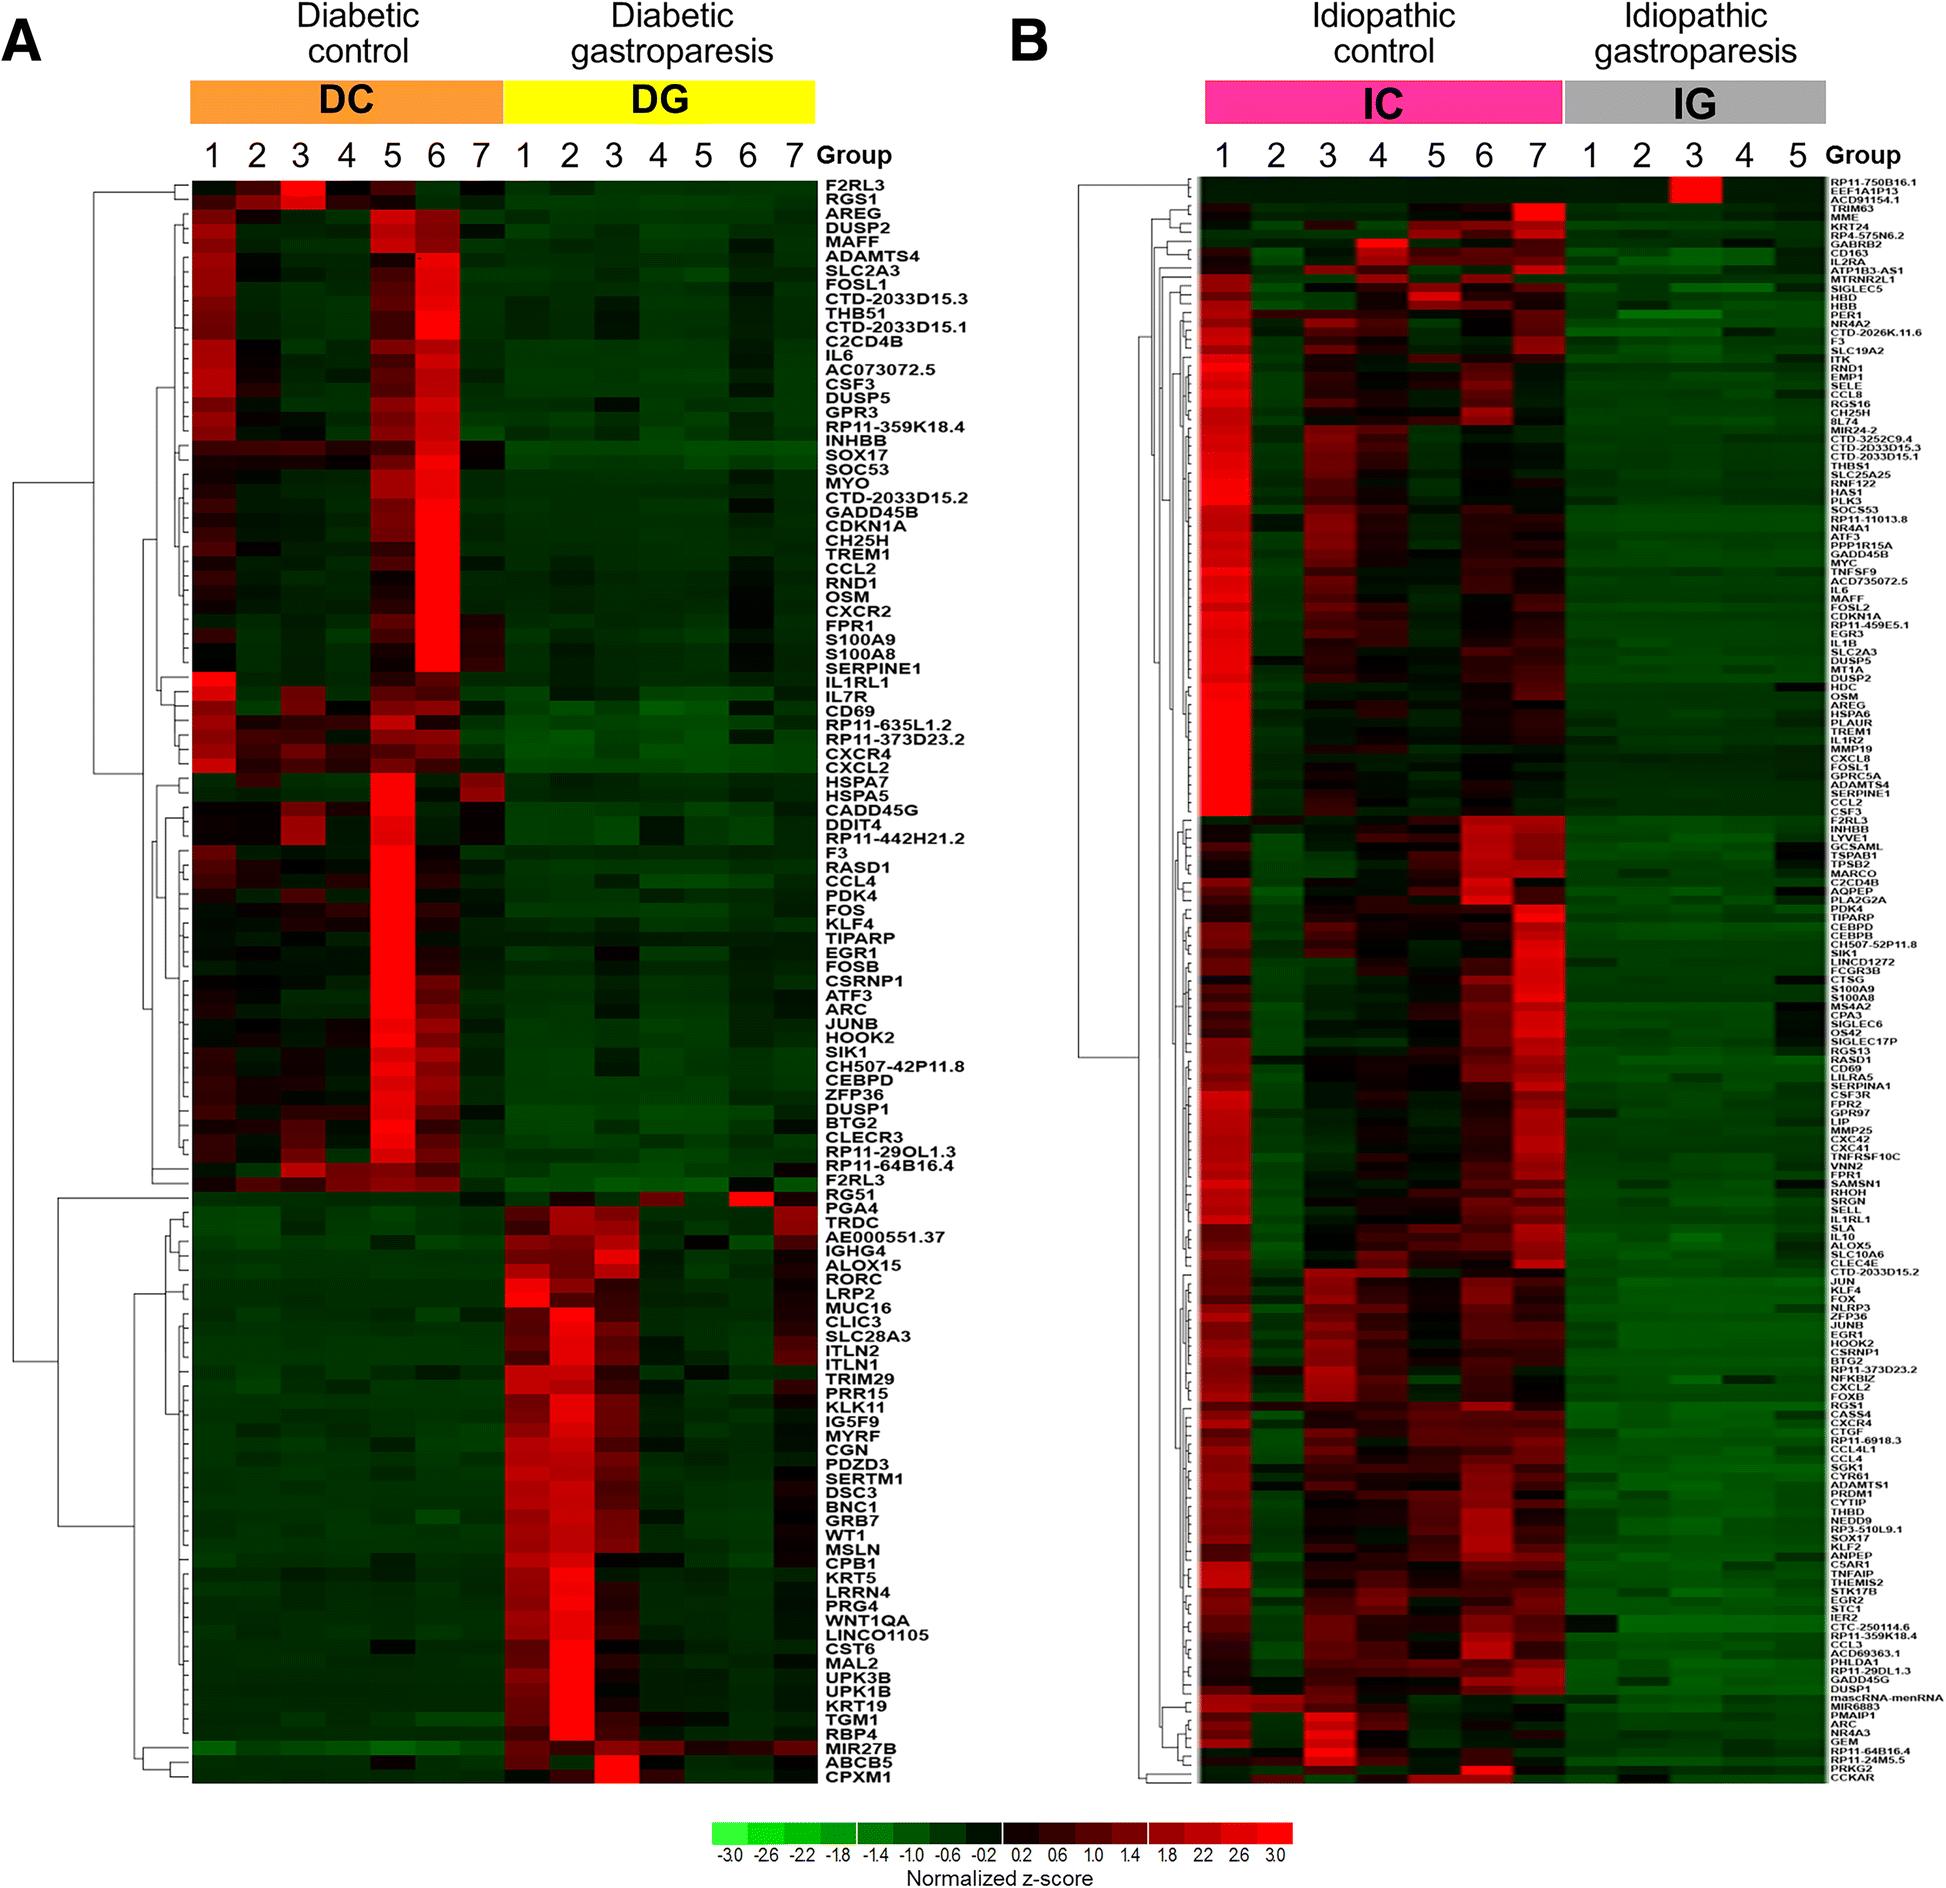 Transcriptomic signatures reveal immune dysregulation in